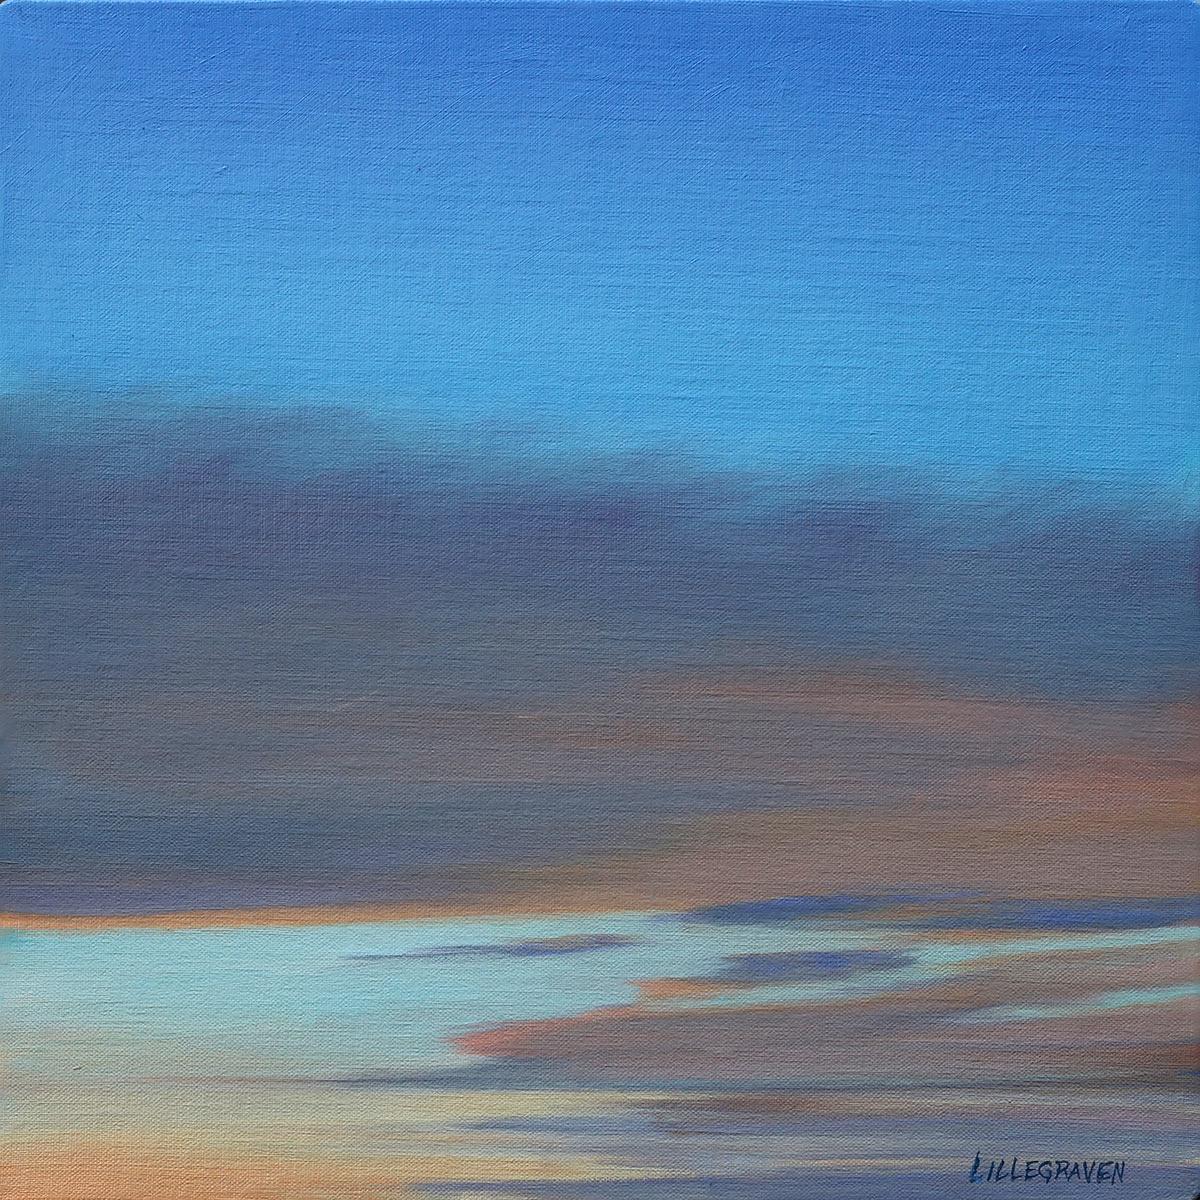 Linda Lillegraven - Western Skies 2